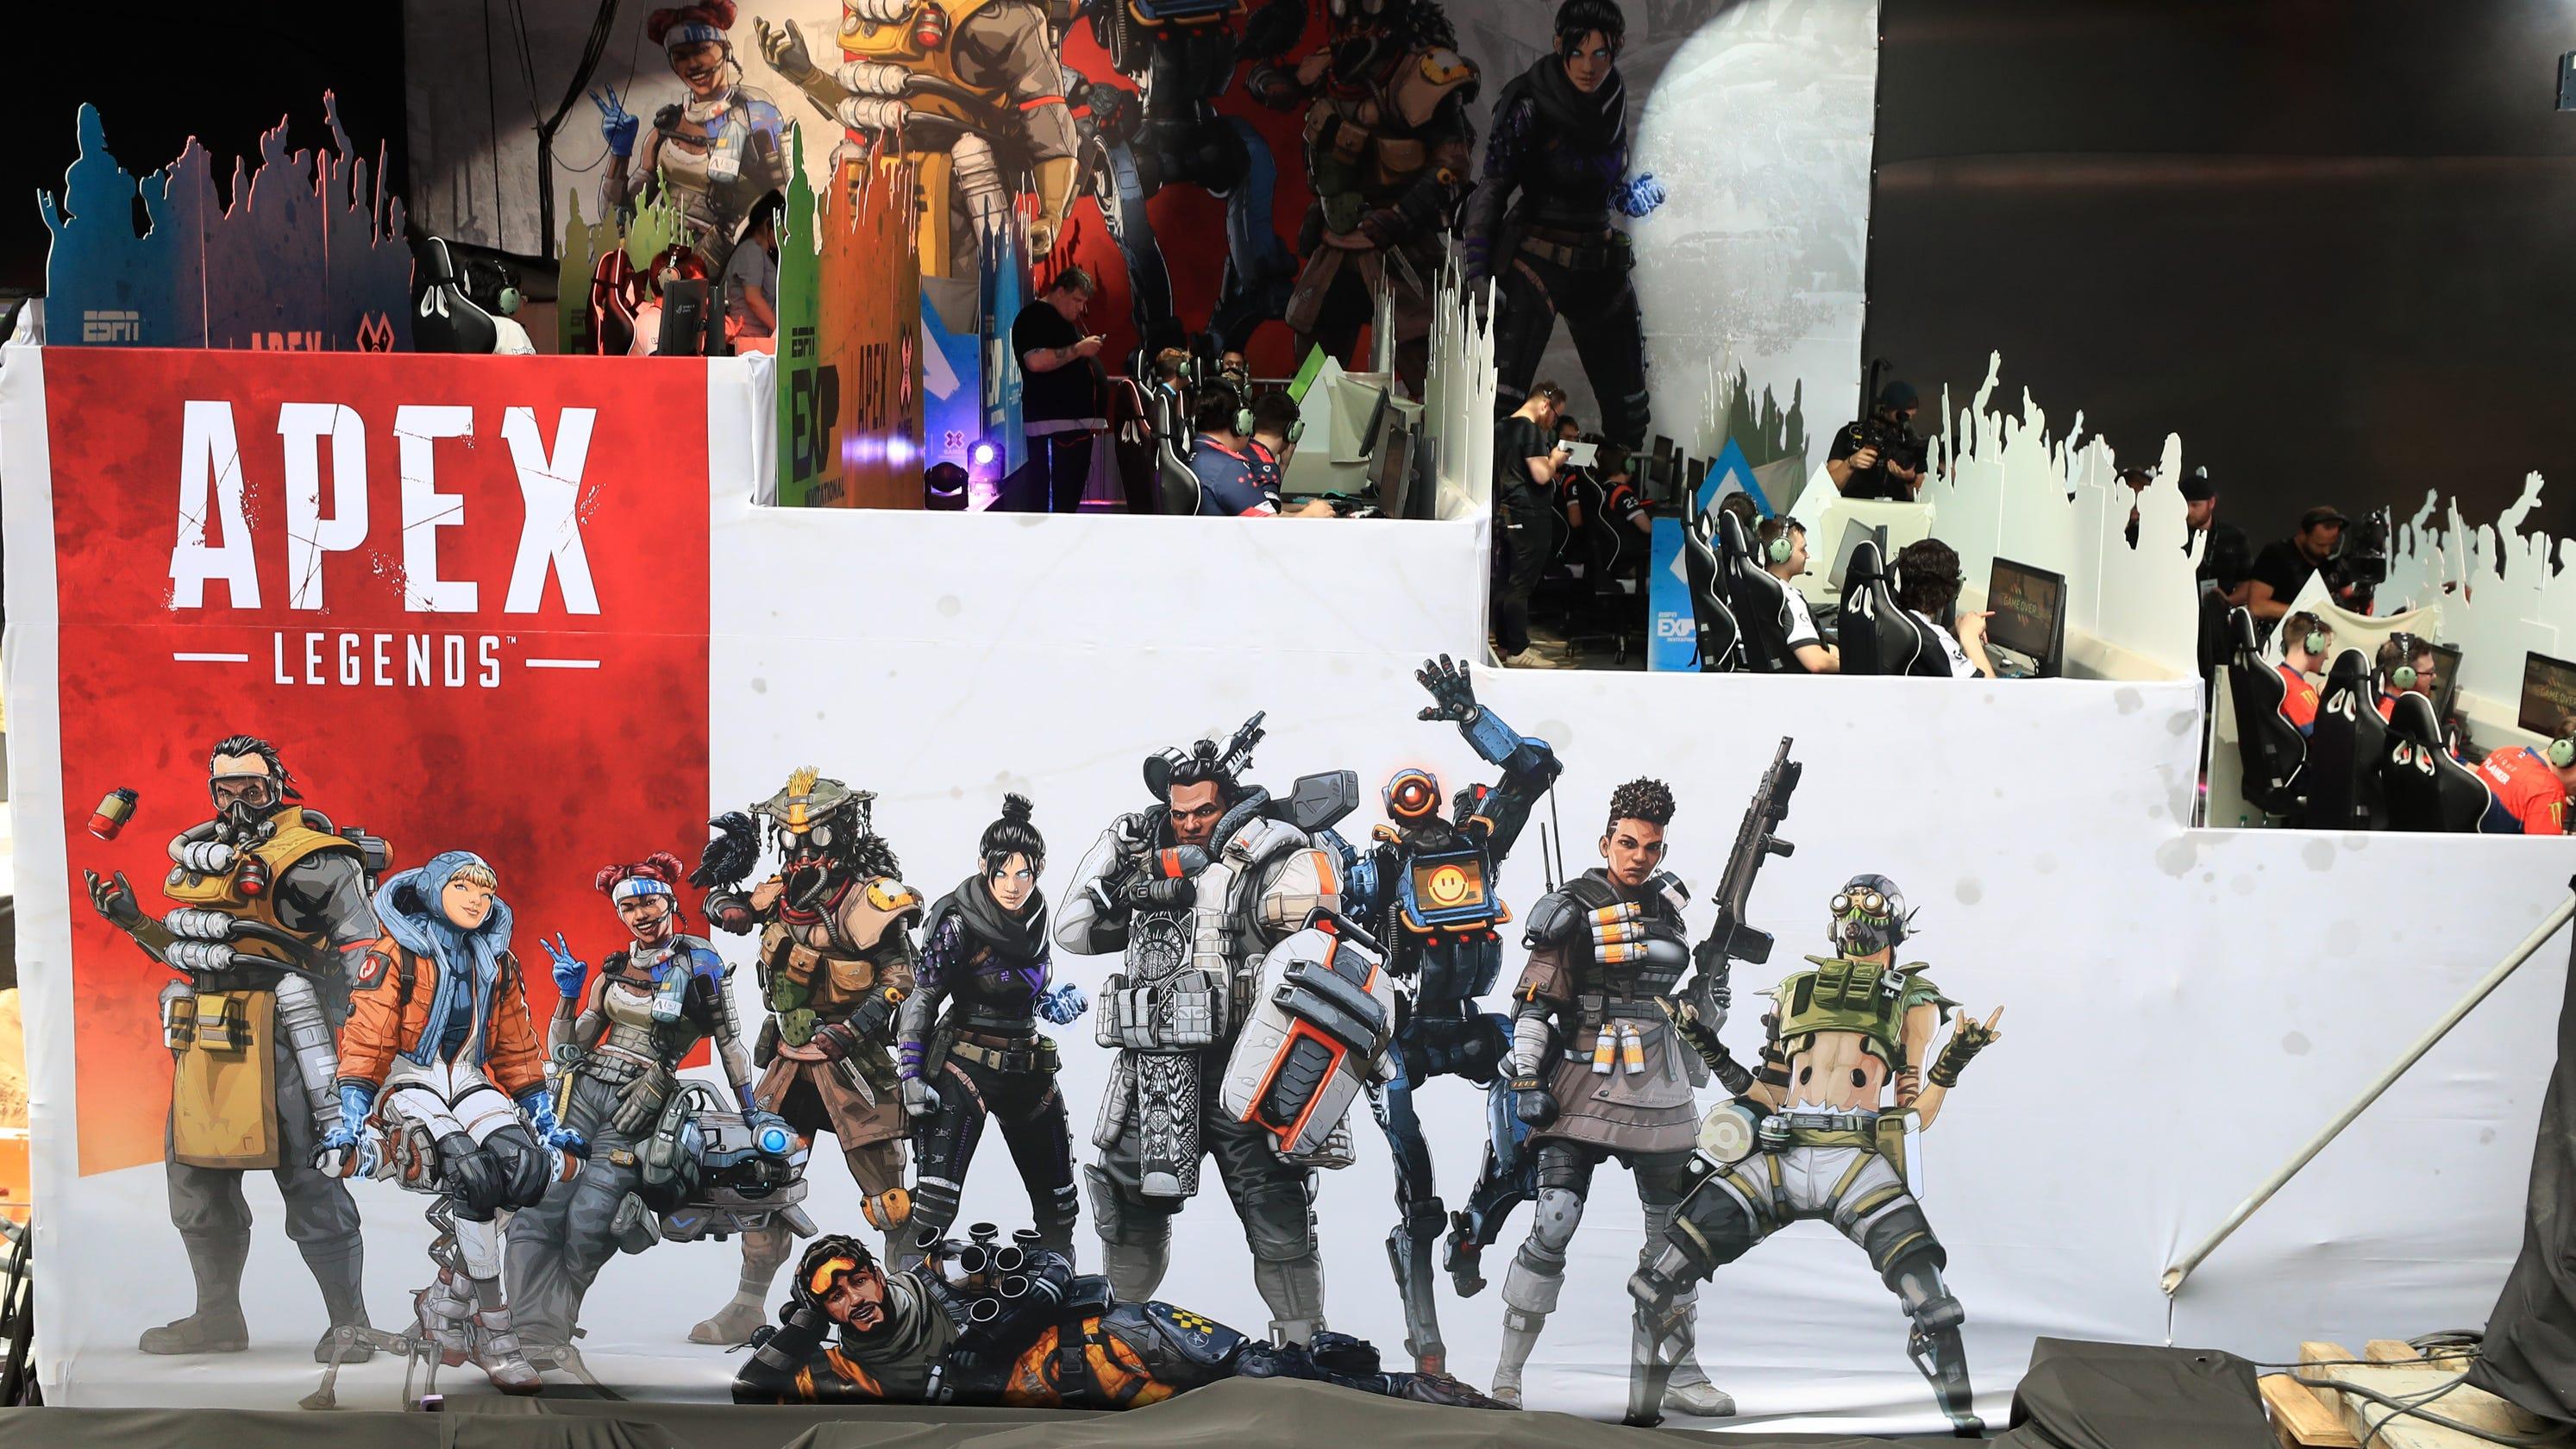 ESPN postpones Apex Legends tournament broadcast in wake of shootings